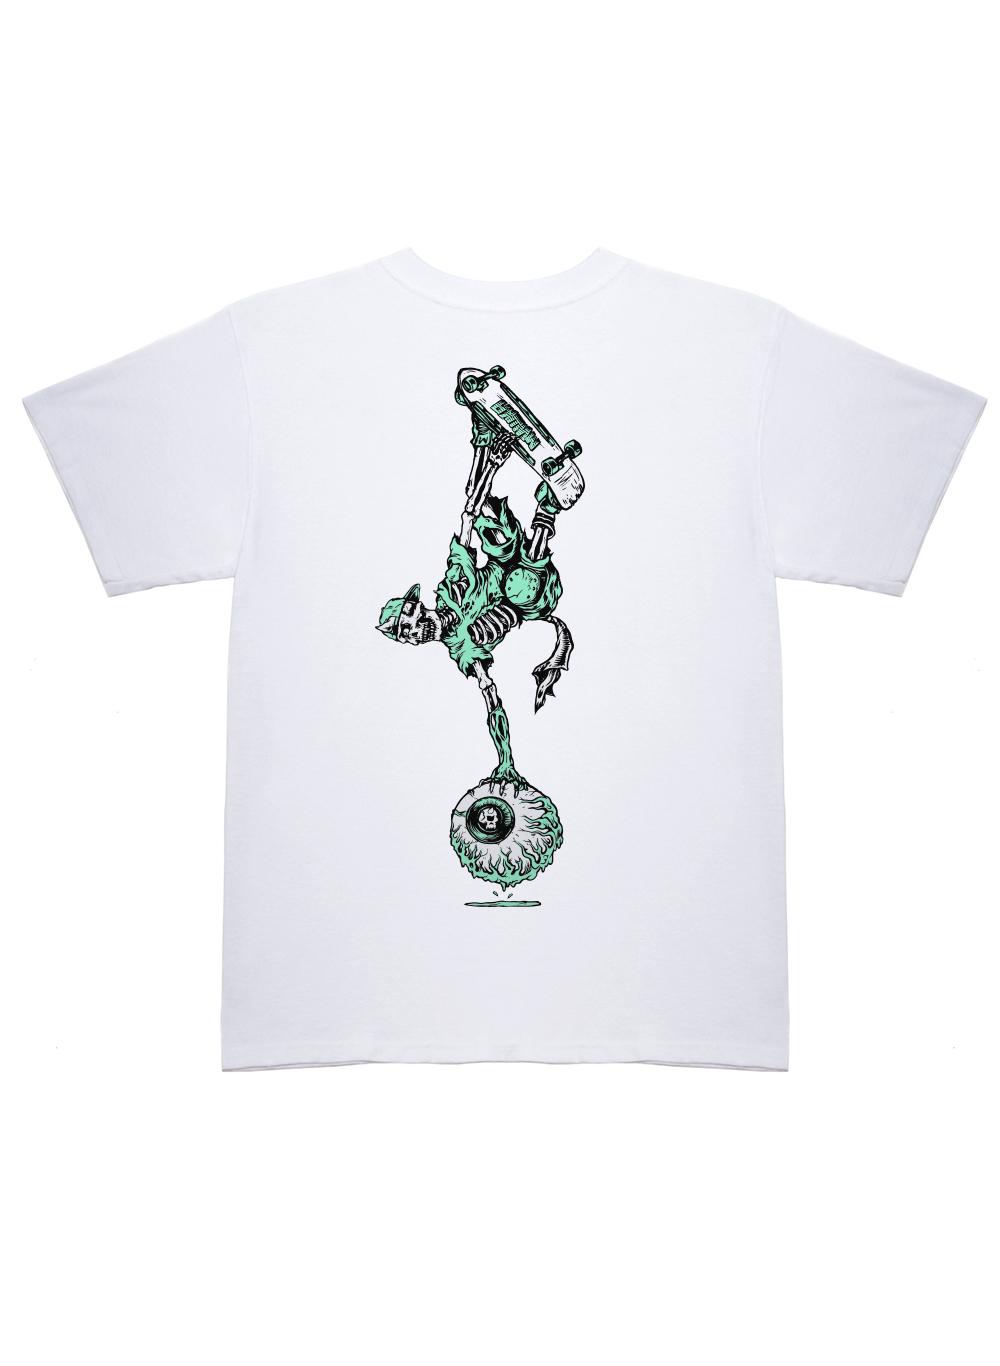 Lamour Supreme: Cyco Handplant T-Shirt